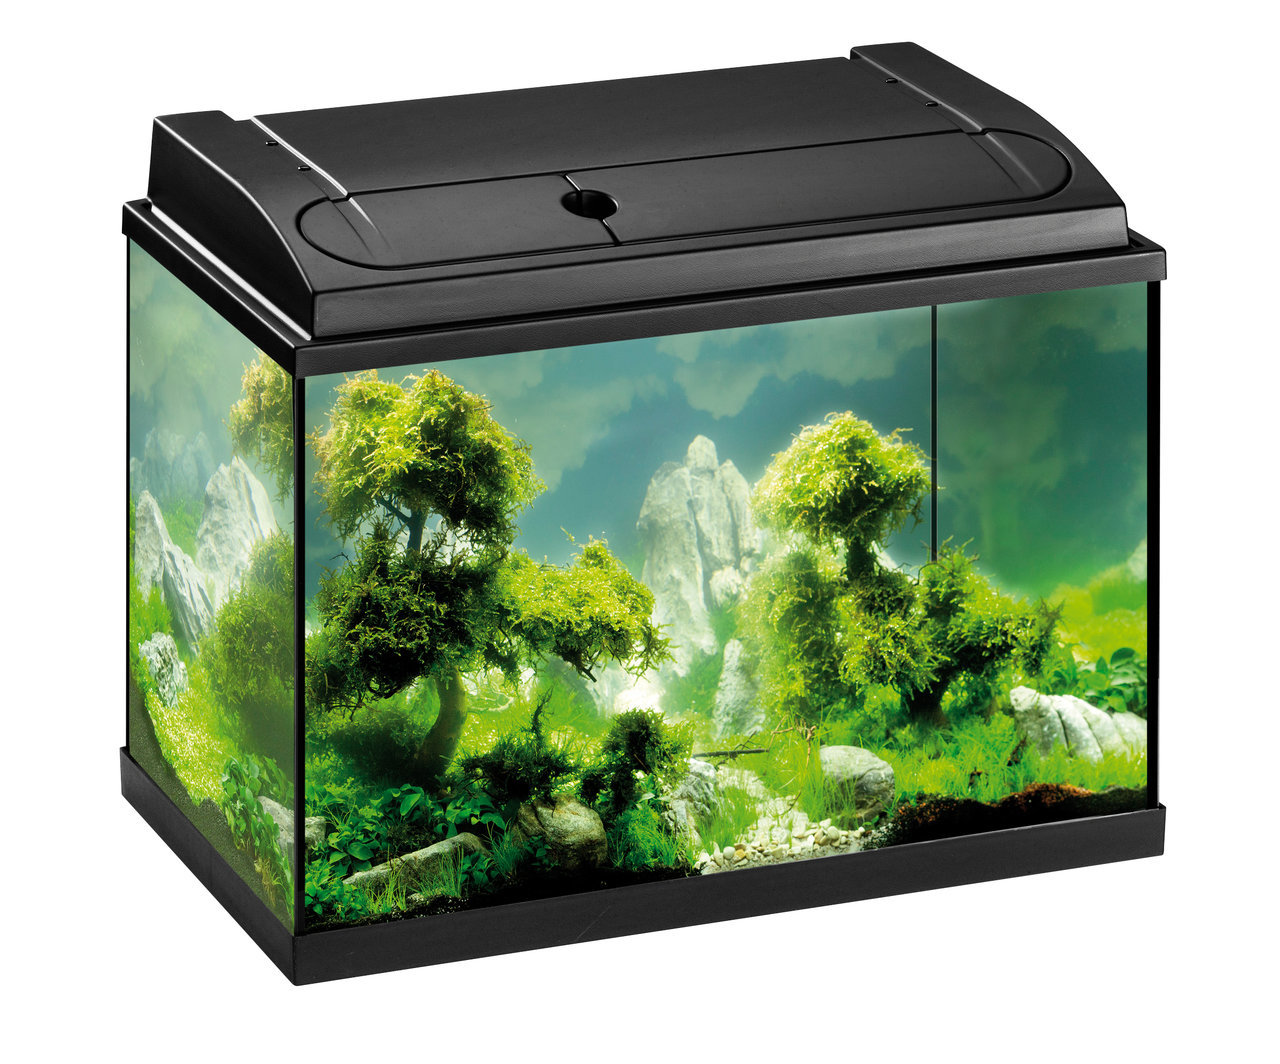 eheim aquapro 84 schwarz aquarium set zoologo. Black Bedroom Furniture Sets. Home Design Ideas